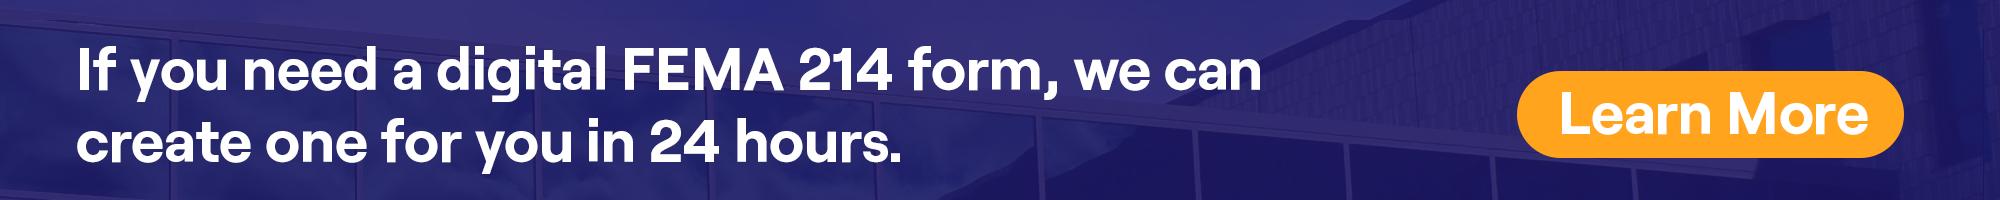 SeamlessDocs can create a digital FEMA 214 form in minutes.